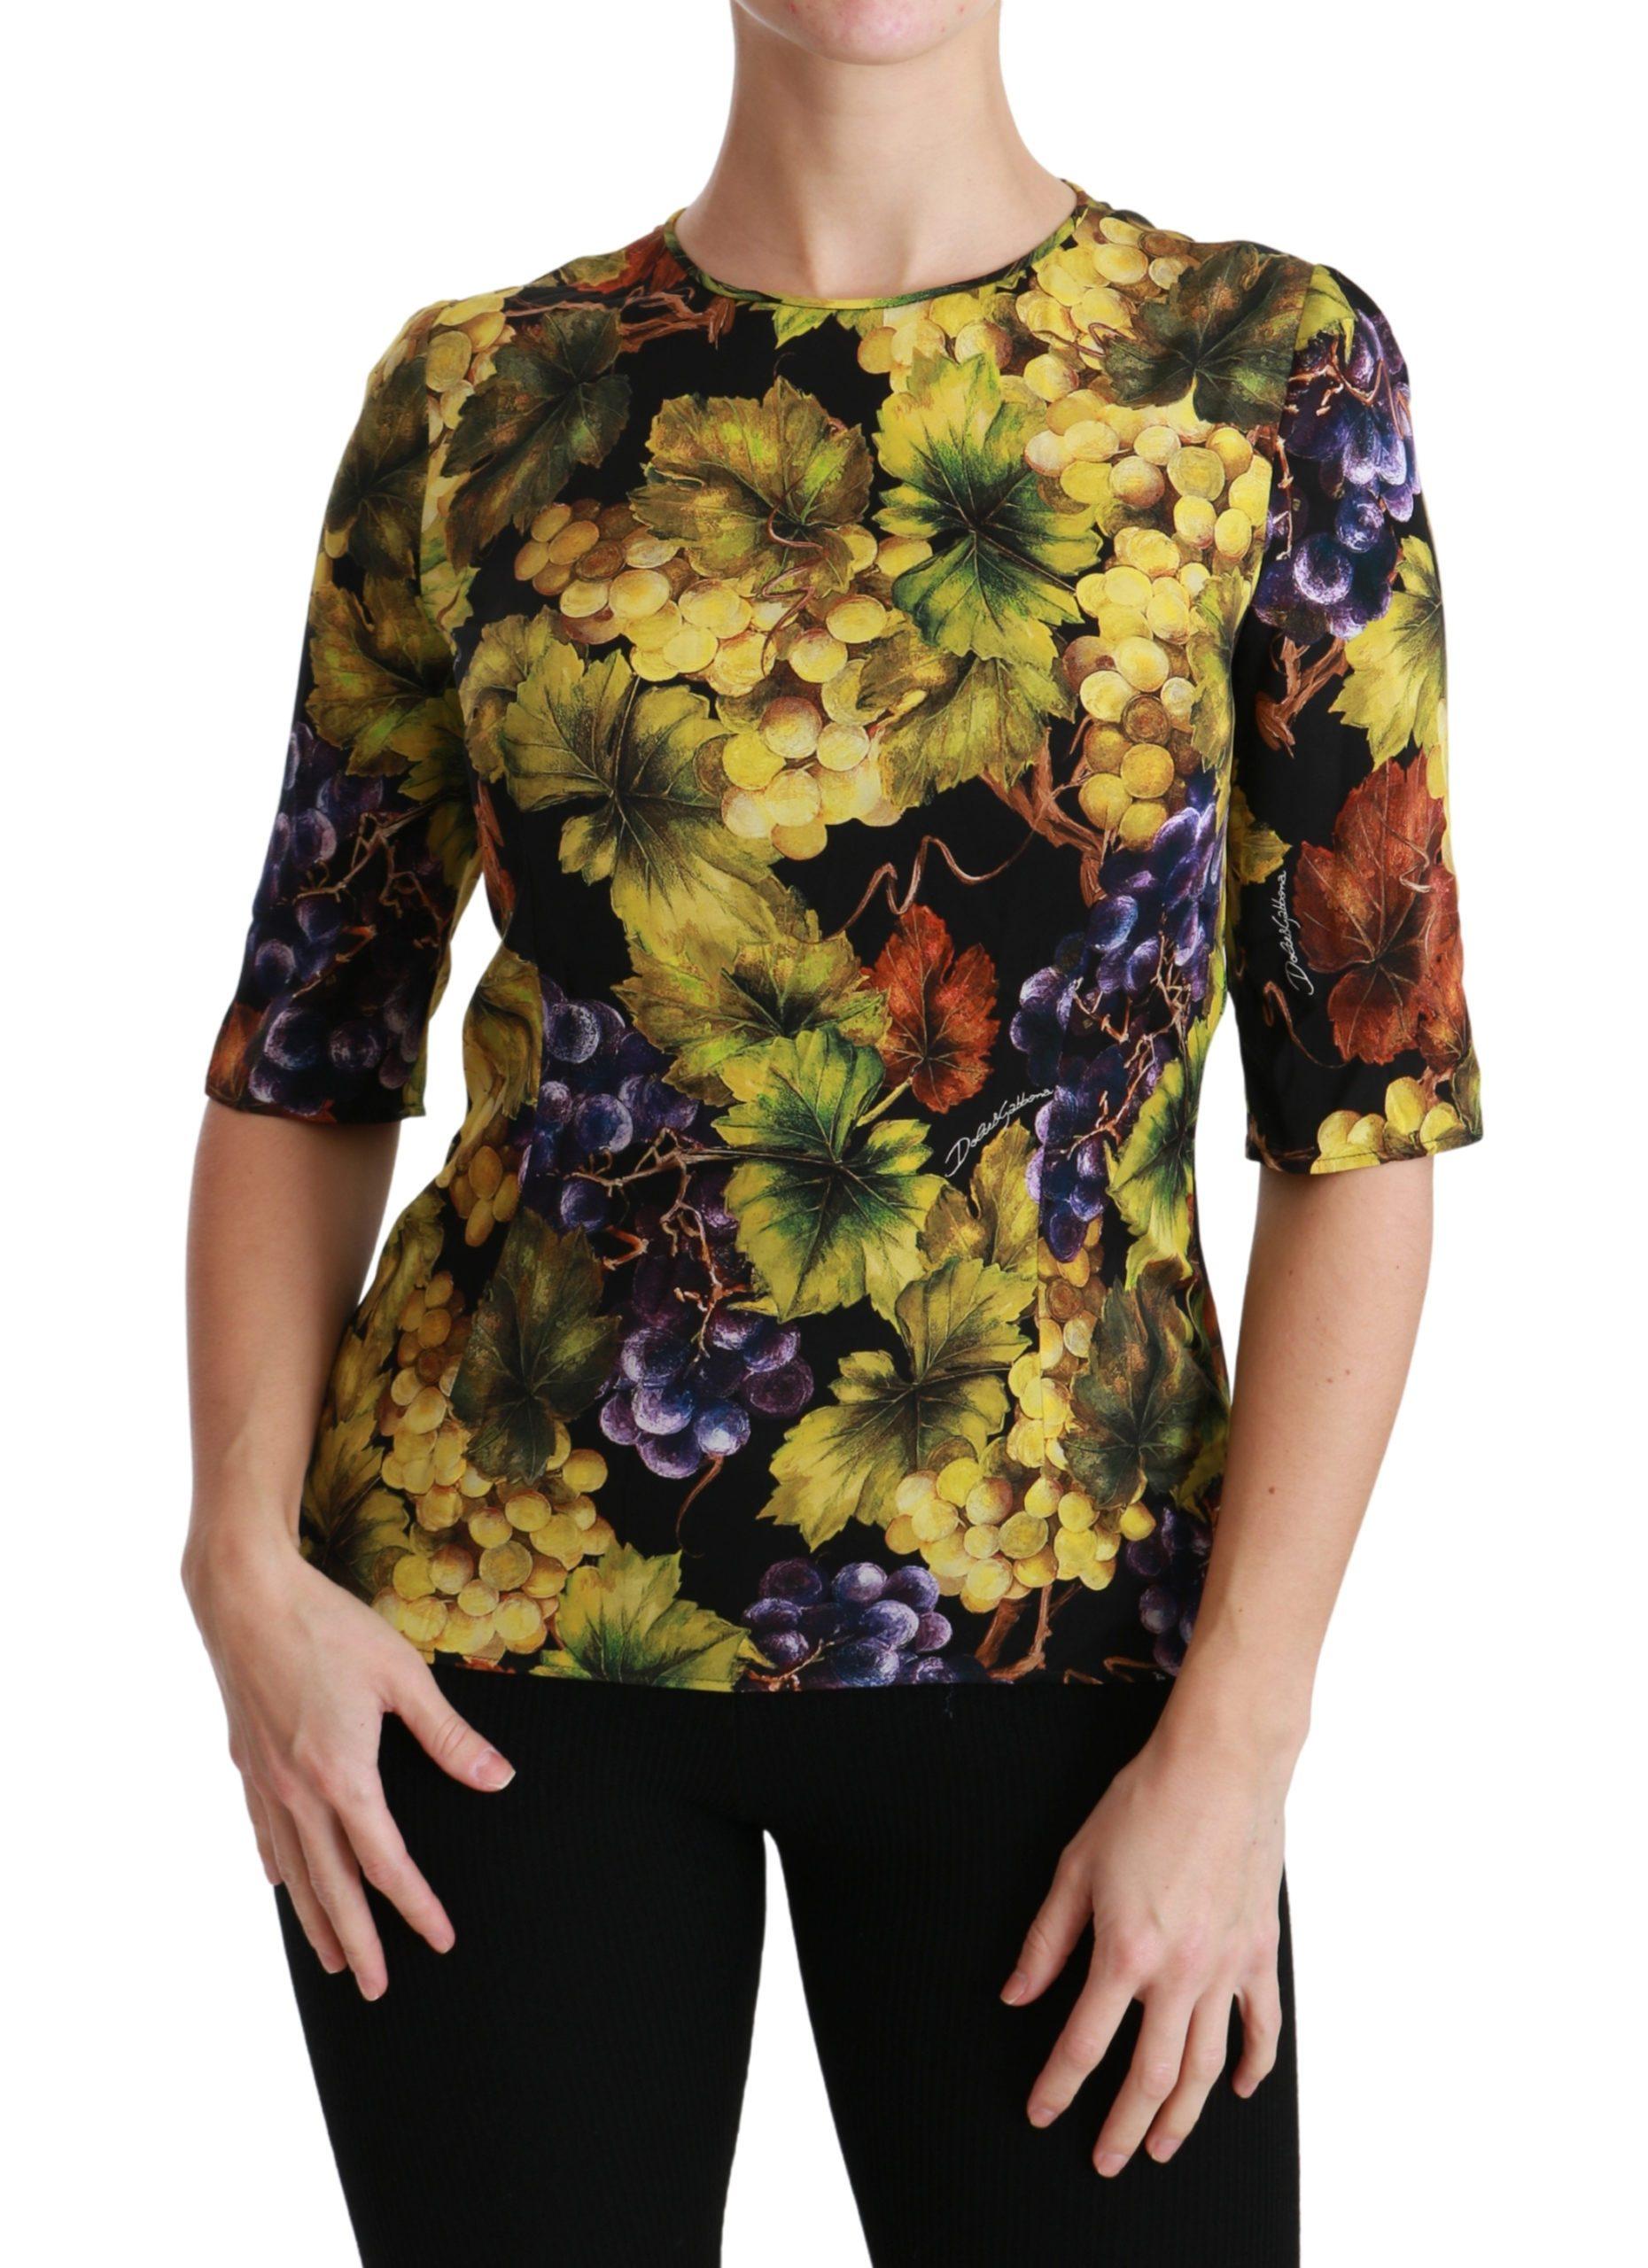 Dolce & Gabbana Women's Grape Floral Stretch Top Black TSH4475 - IT38   S